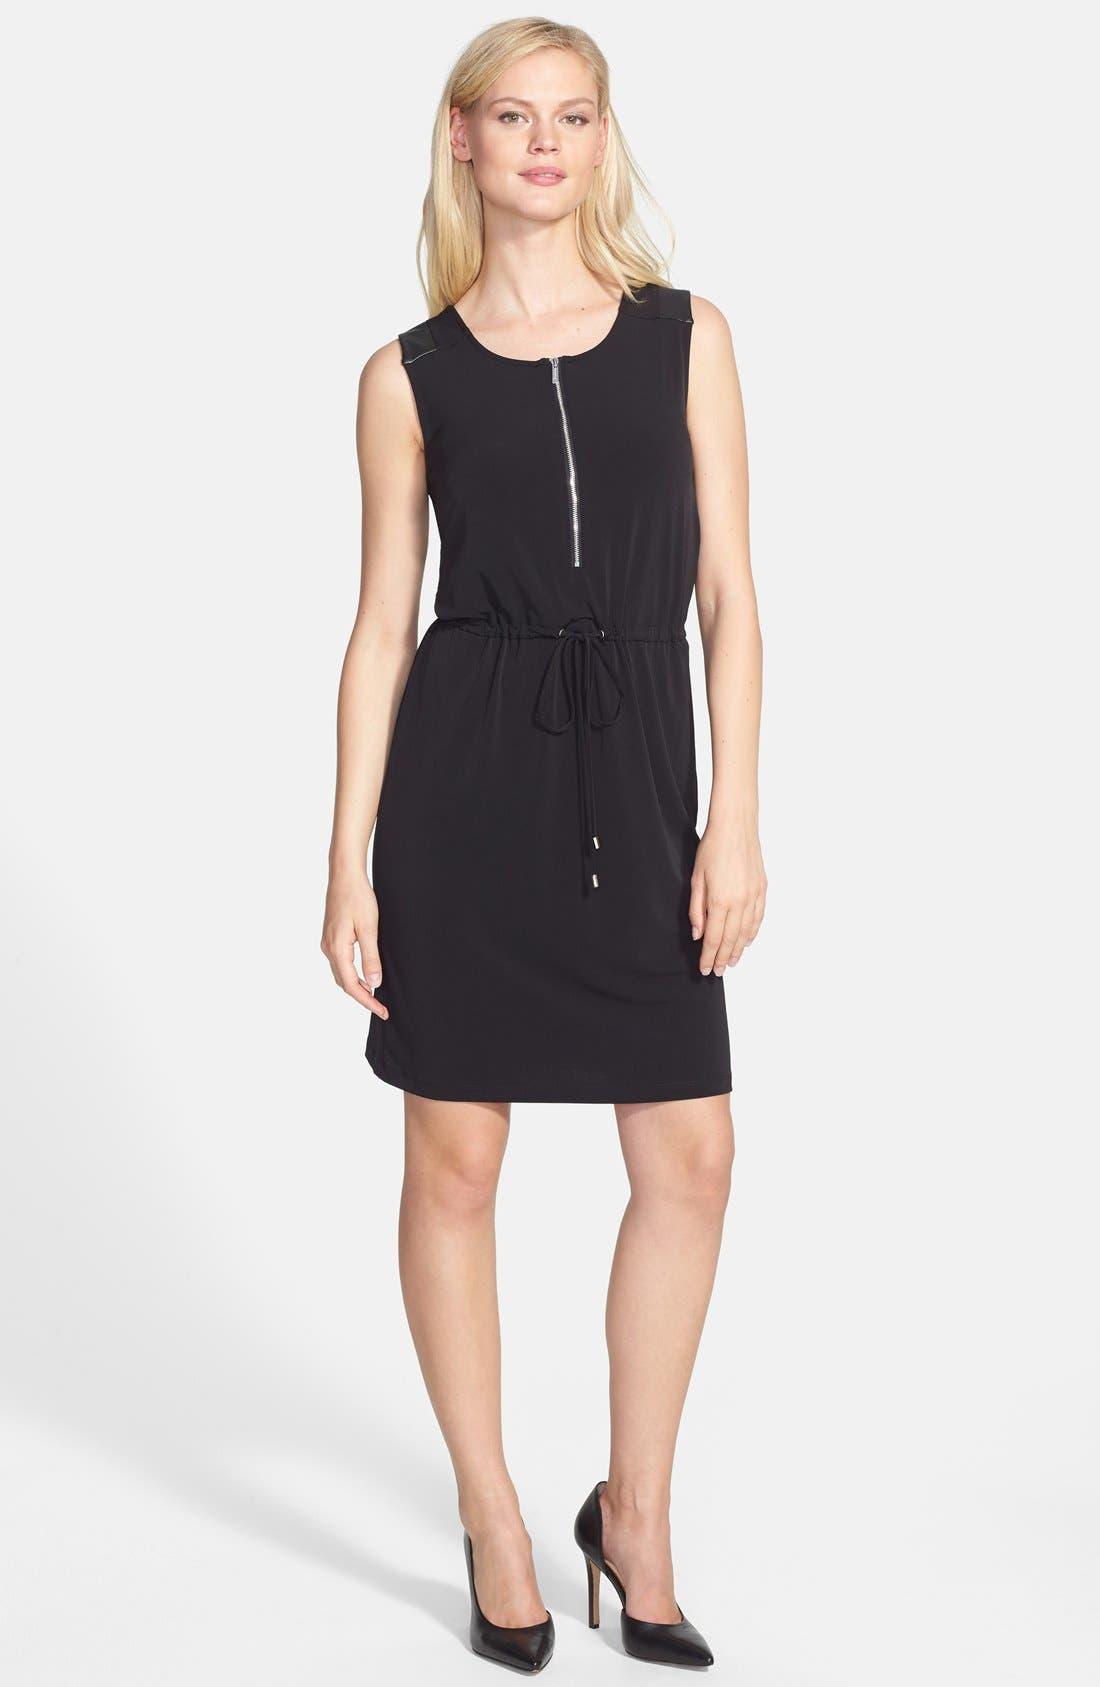 Alternate Image 1 Selected - Calvin Klein Faux Leather Trim Drawstring Waist Dress